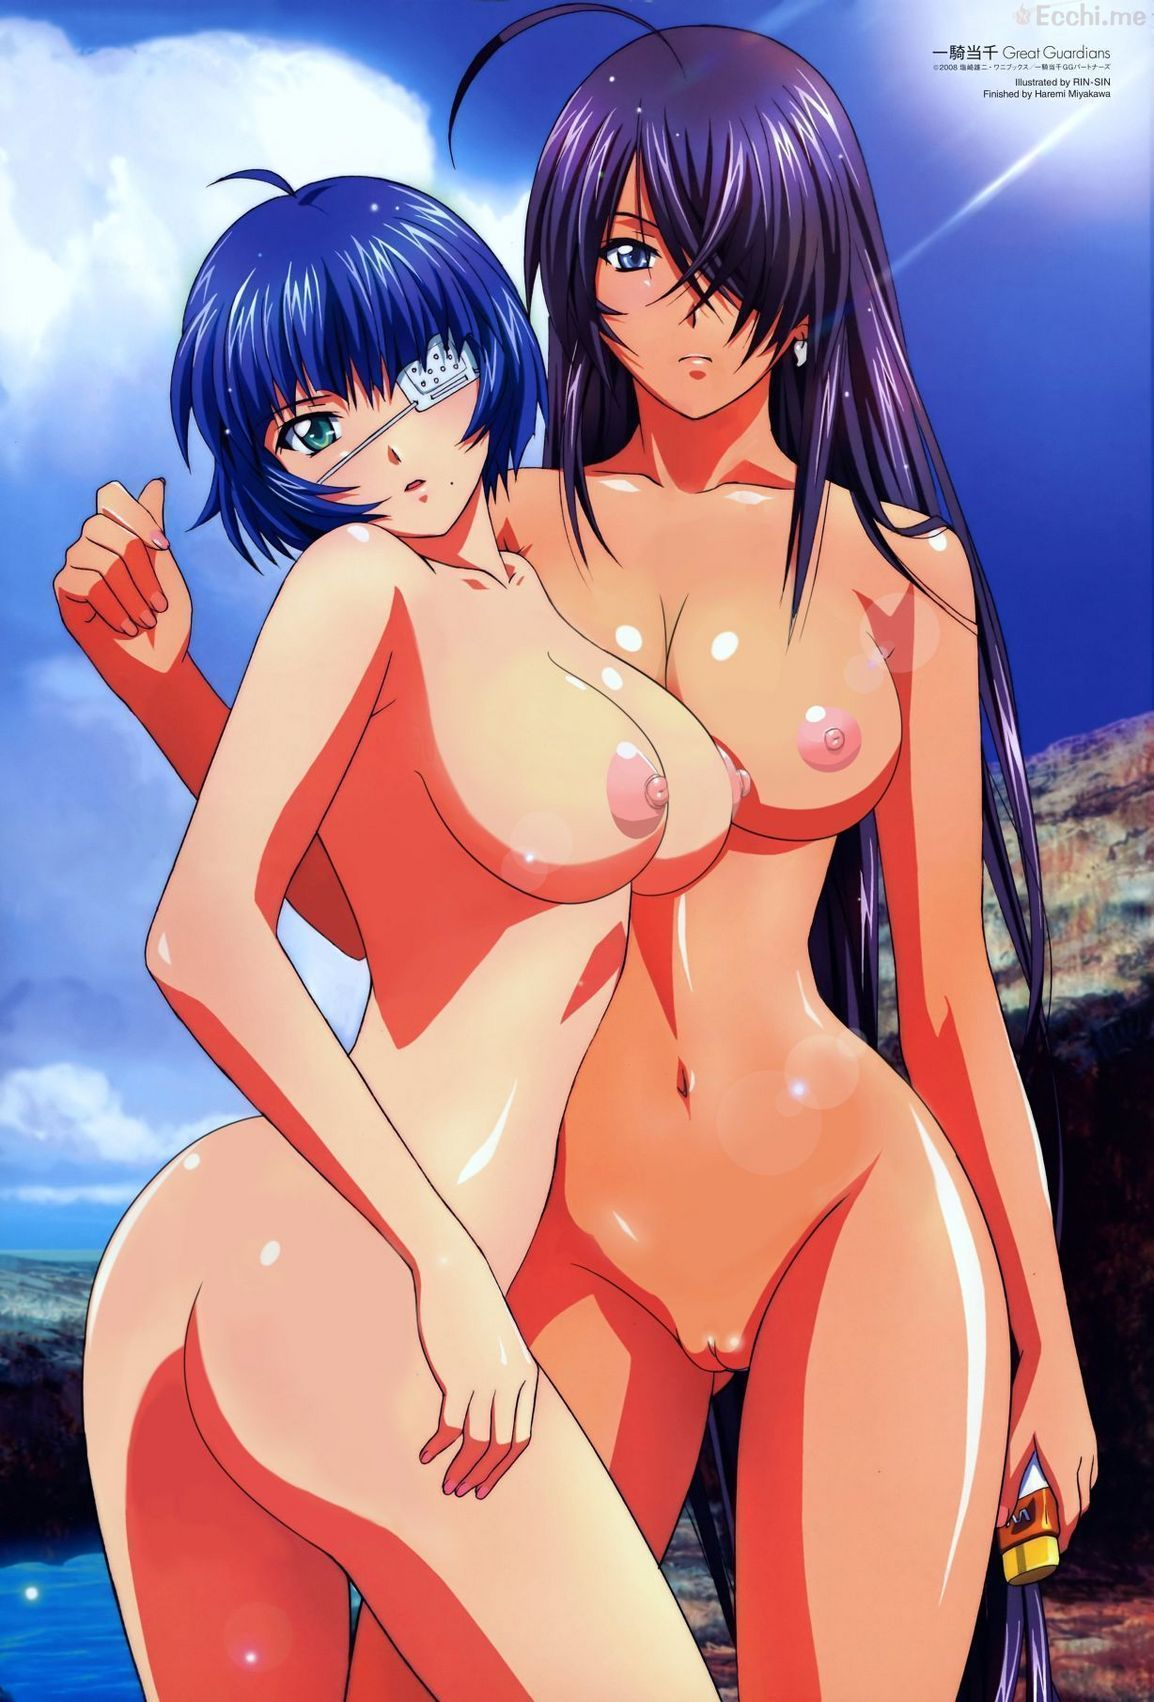 Ikkitousen Hentai Pic Hentai Original Media Ikki Tousen: www.hentairider.com/ikkitousen-hentai-pic/139644.html